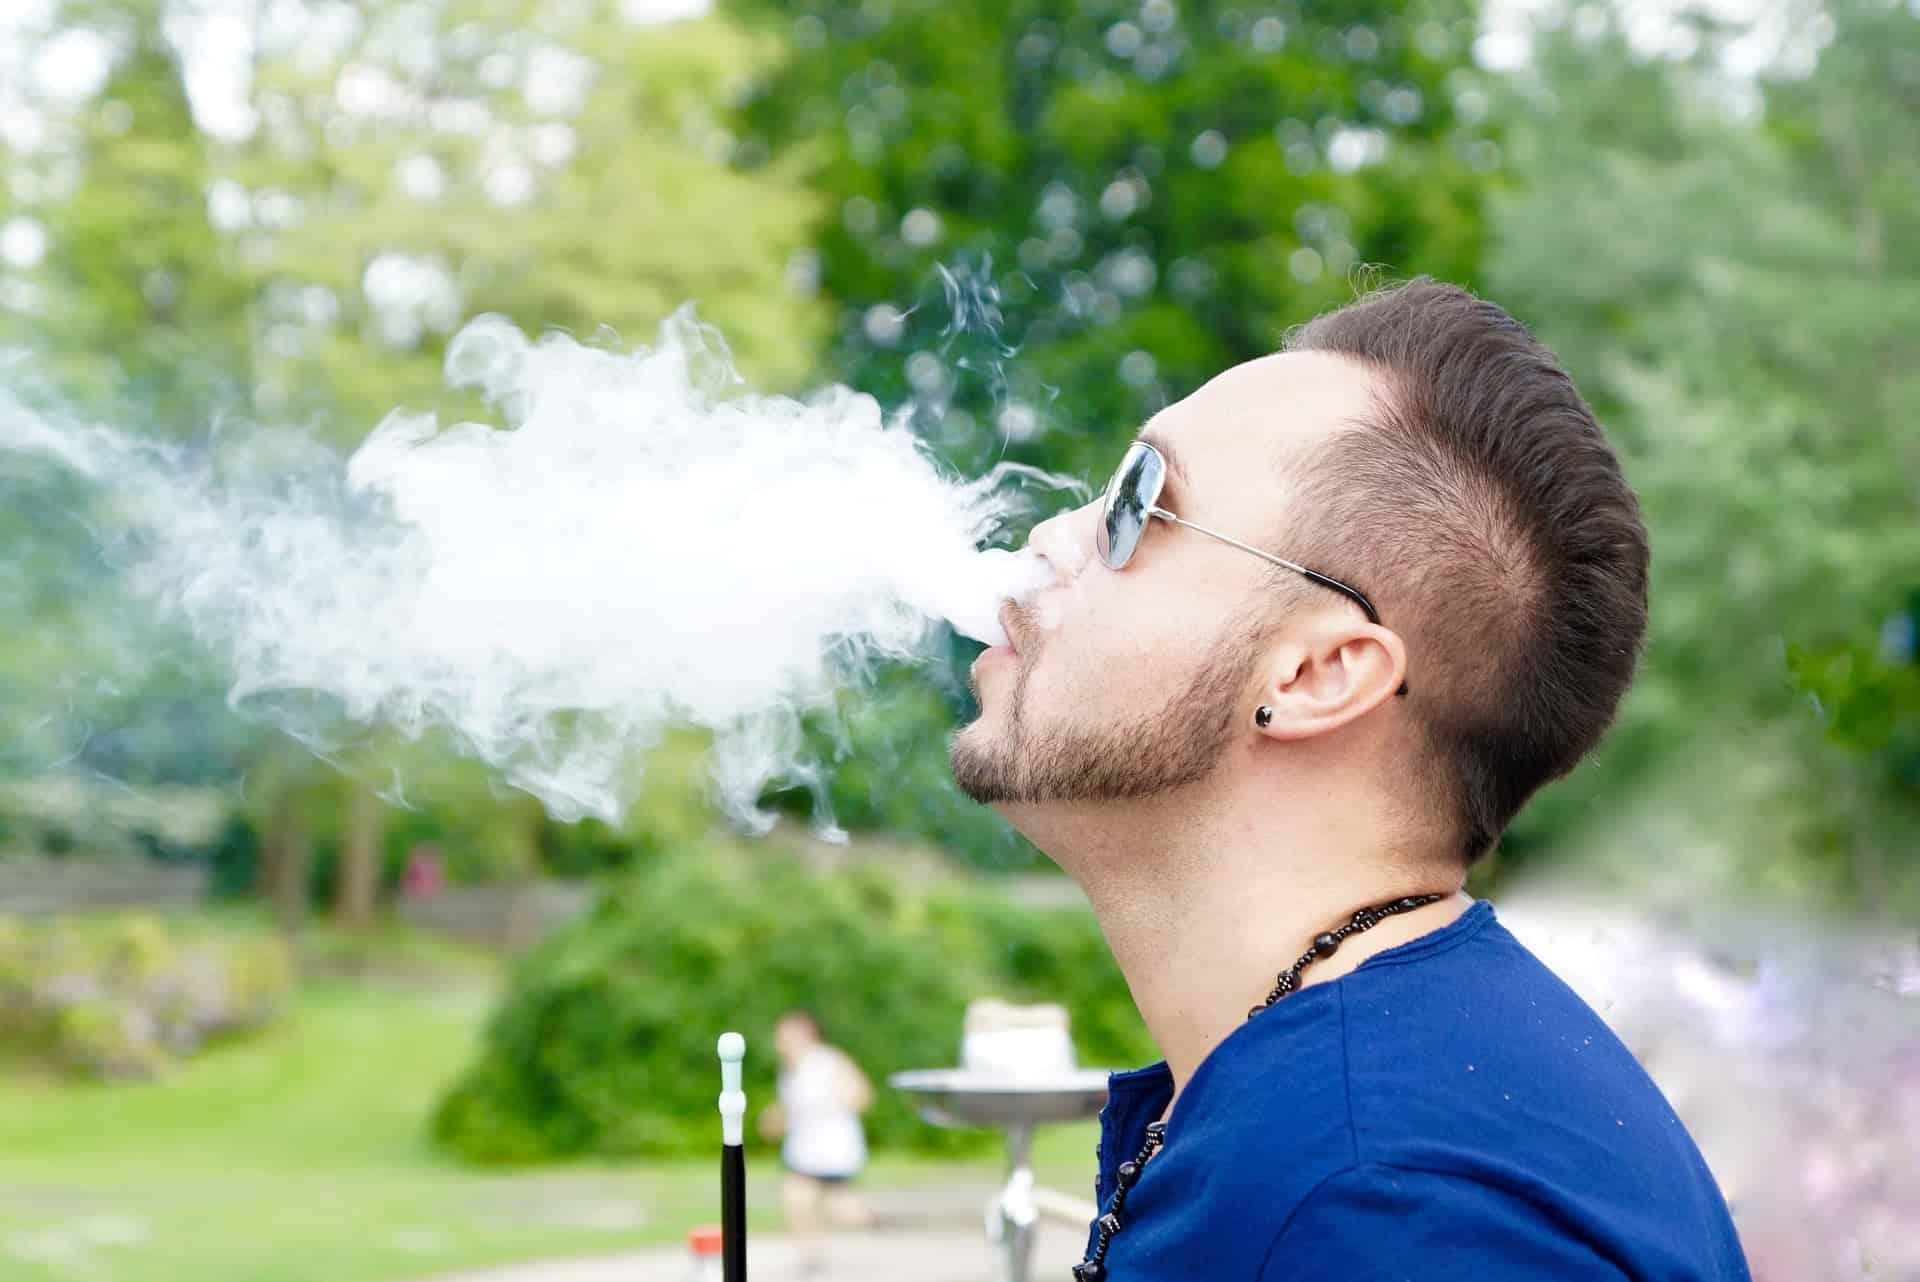 Mann raucht Shisha